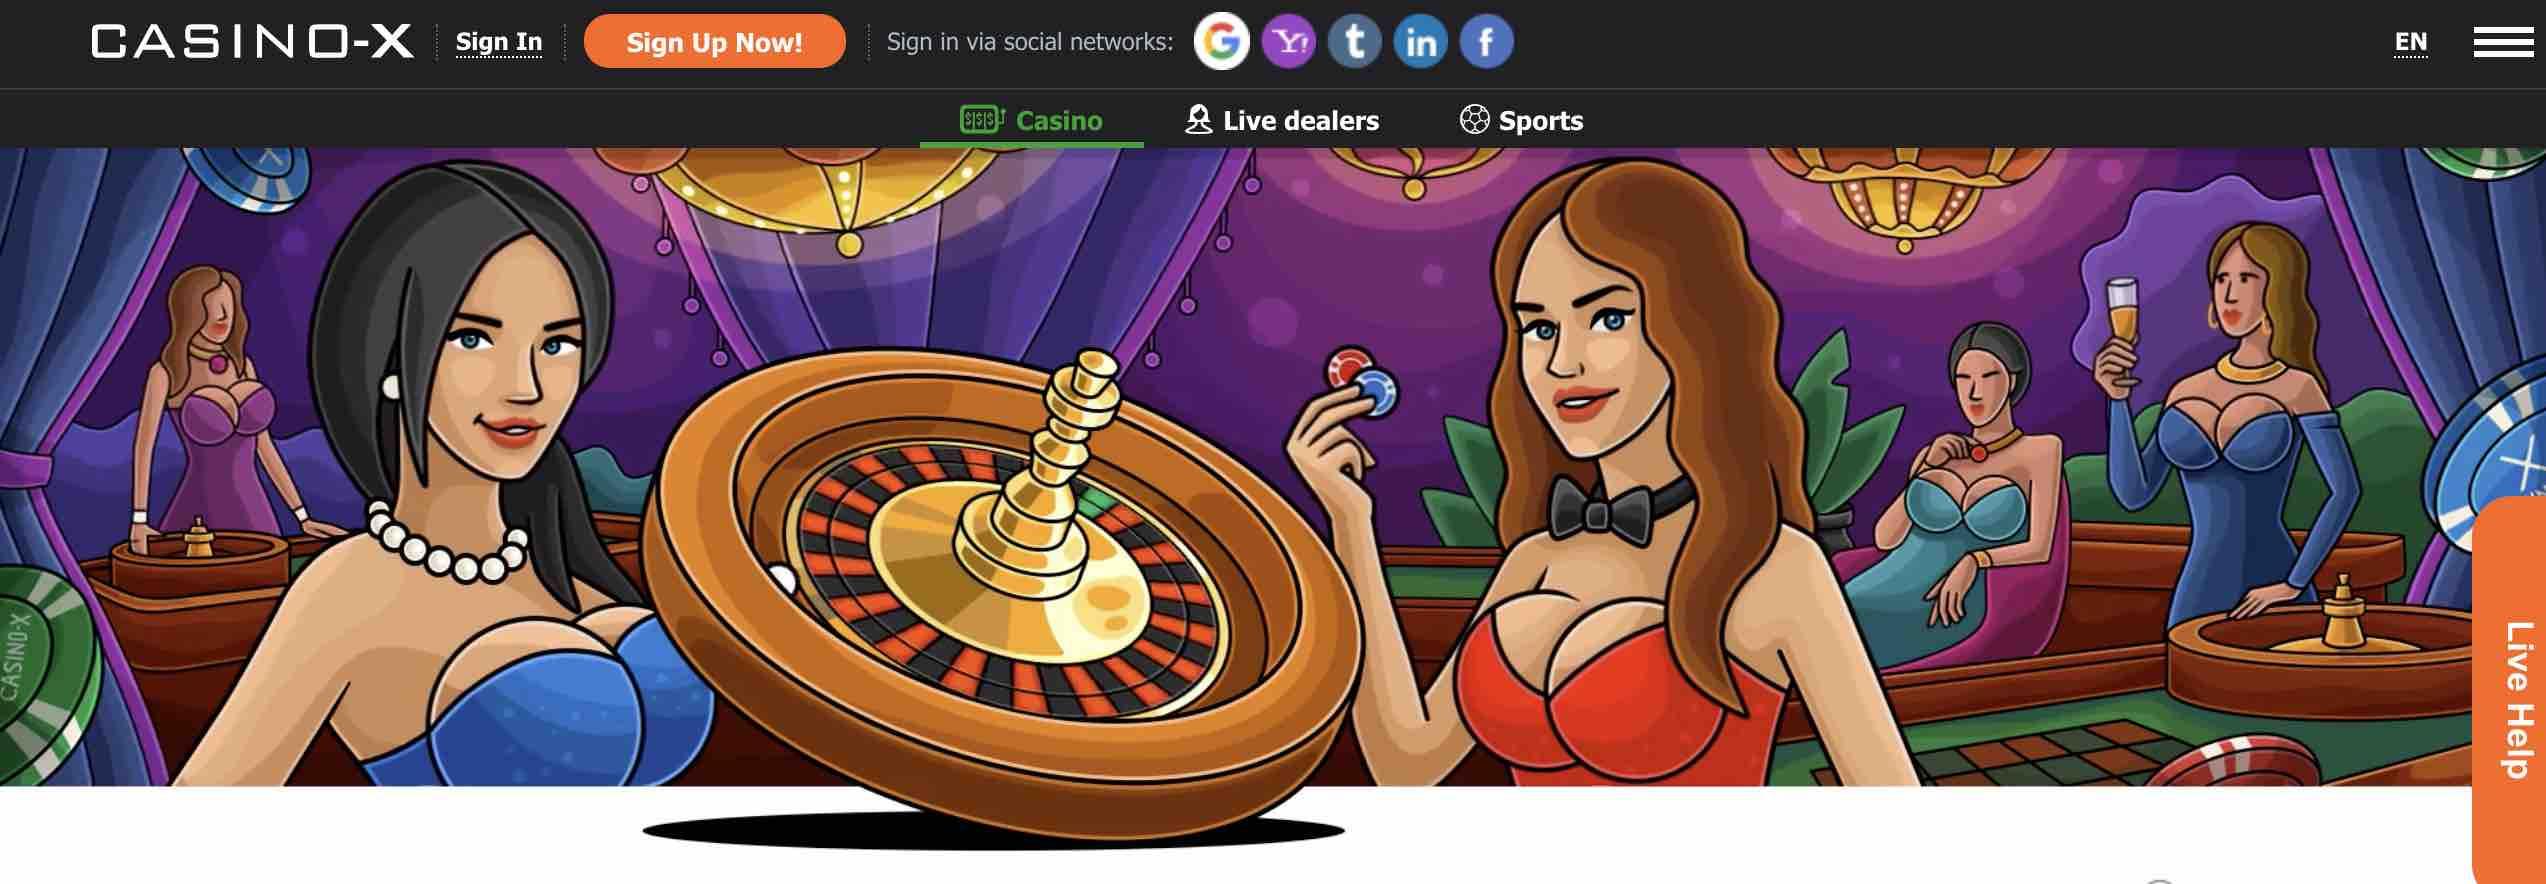 Casino X Roulette and Blackjack